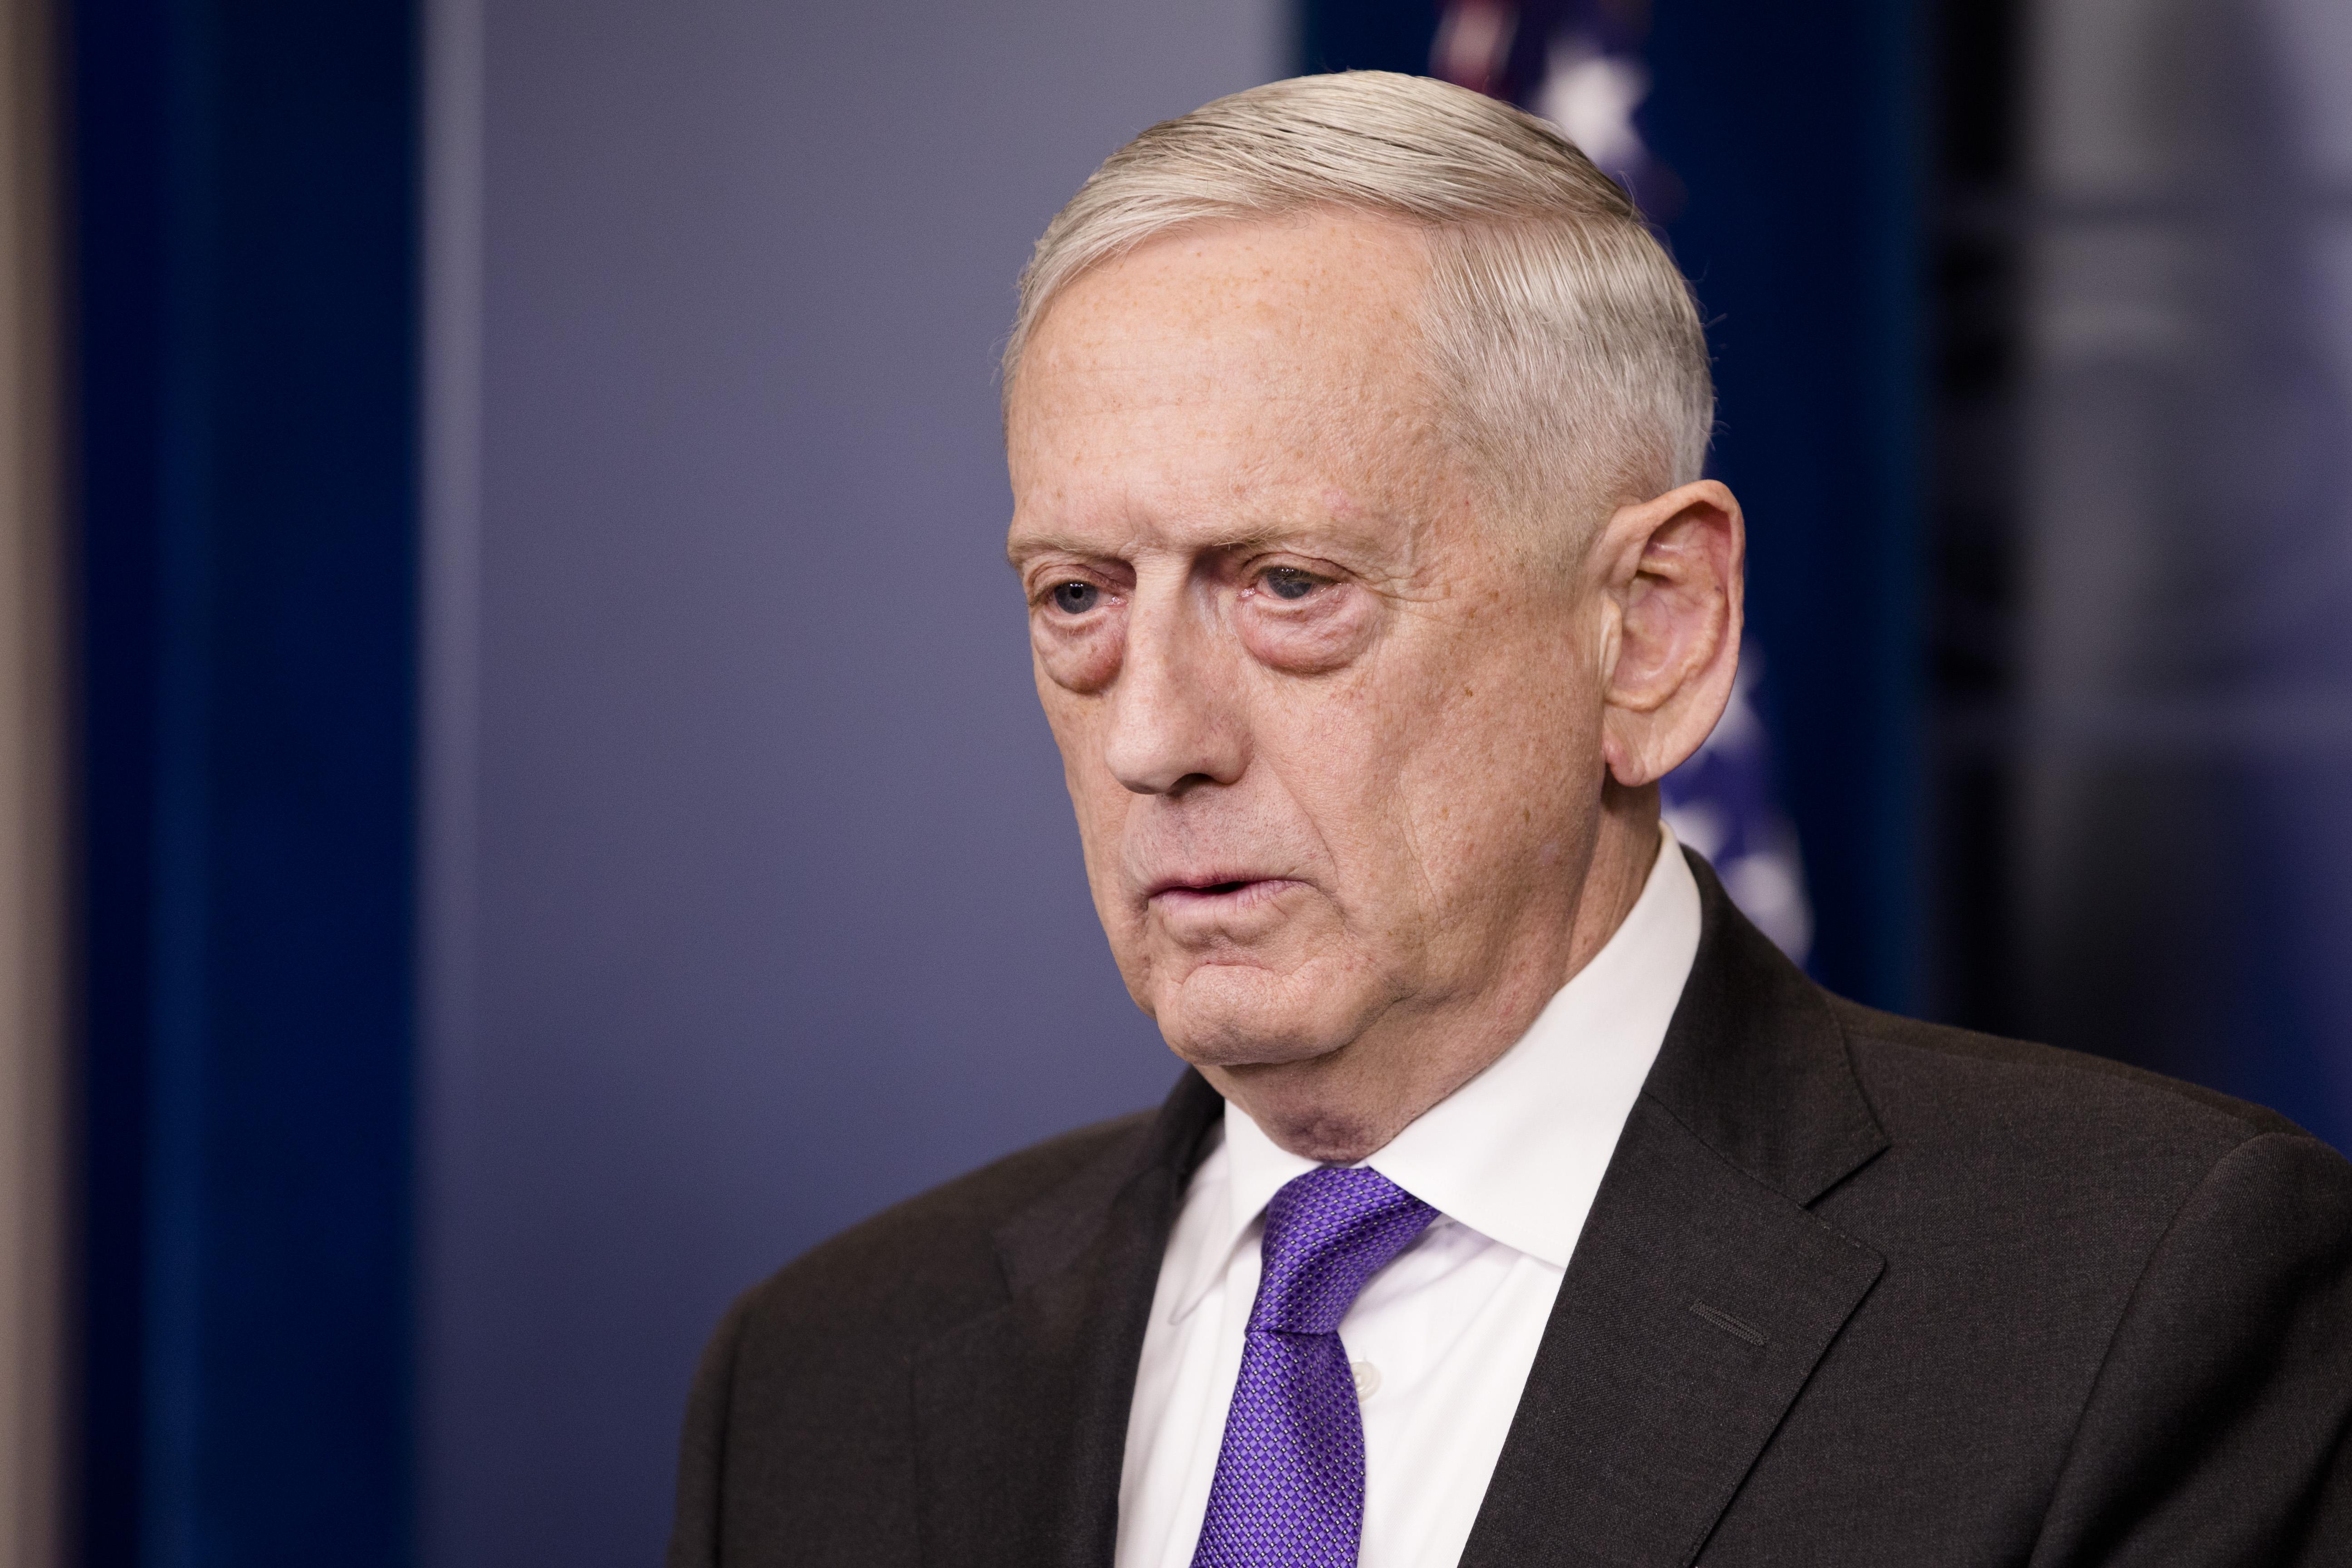 Secretary of Defense Jim Mattis at the White House